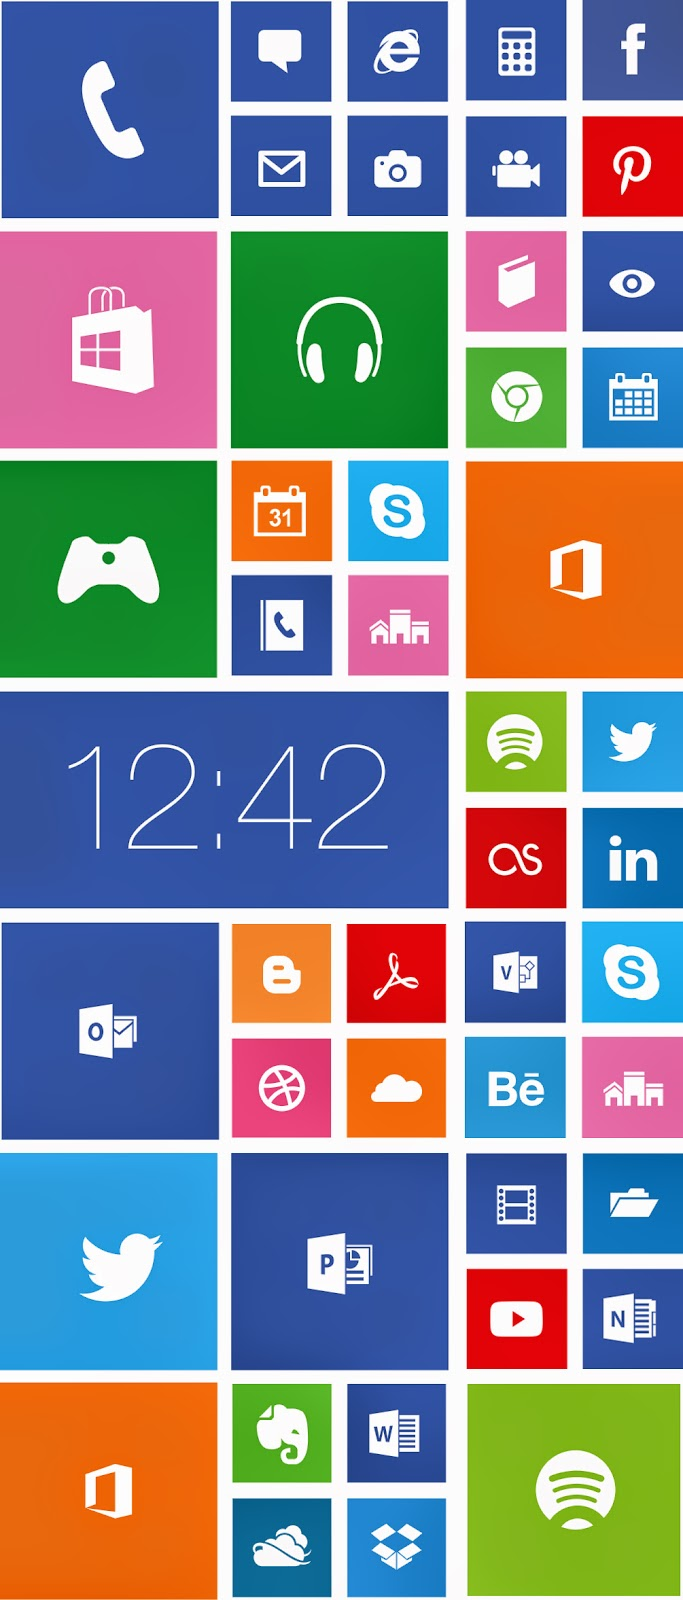 Windows Phone 8 Icons